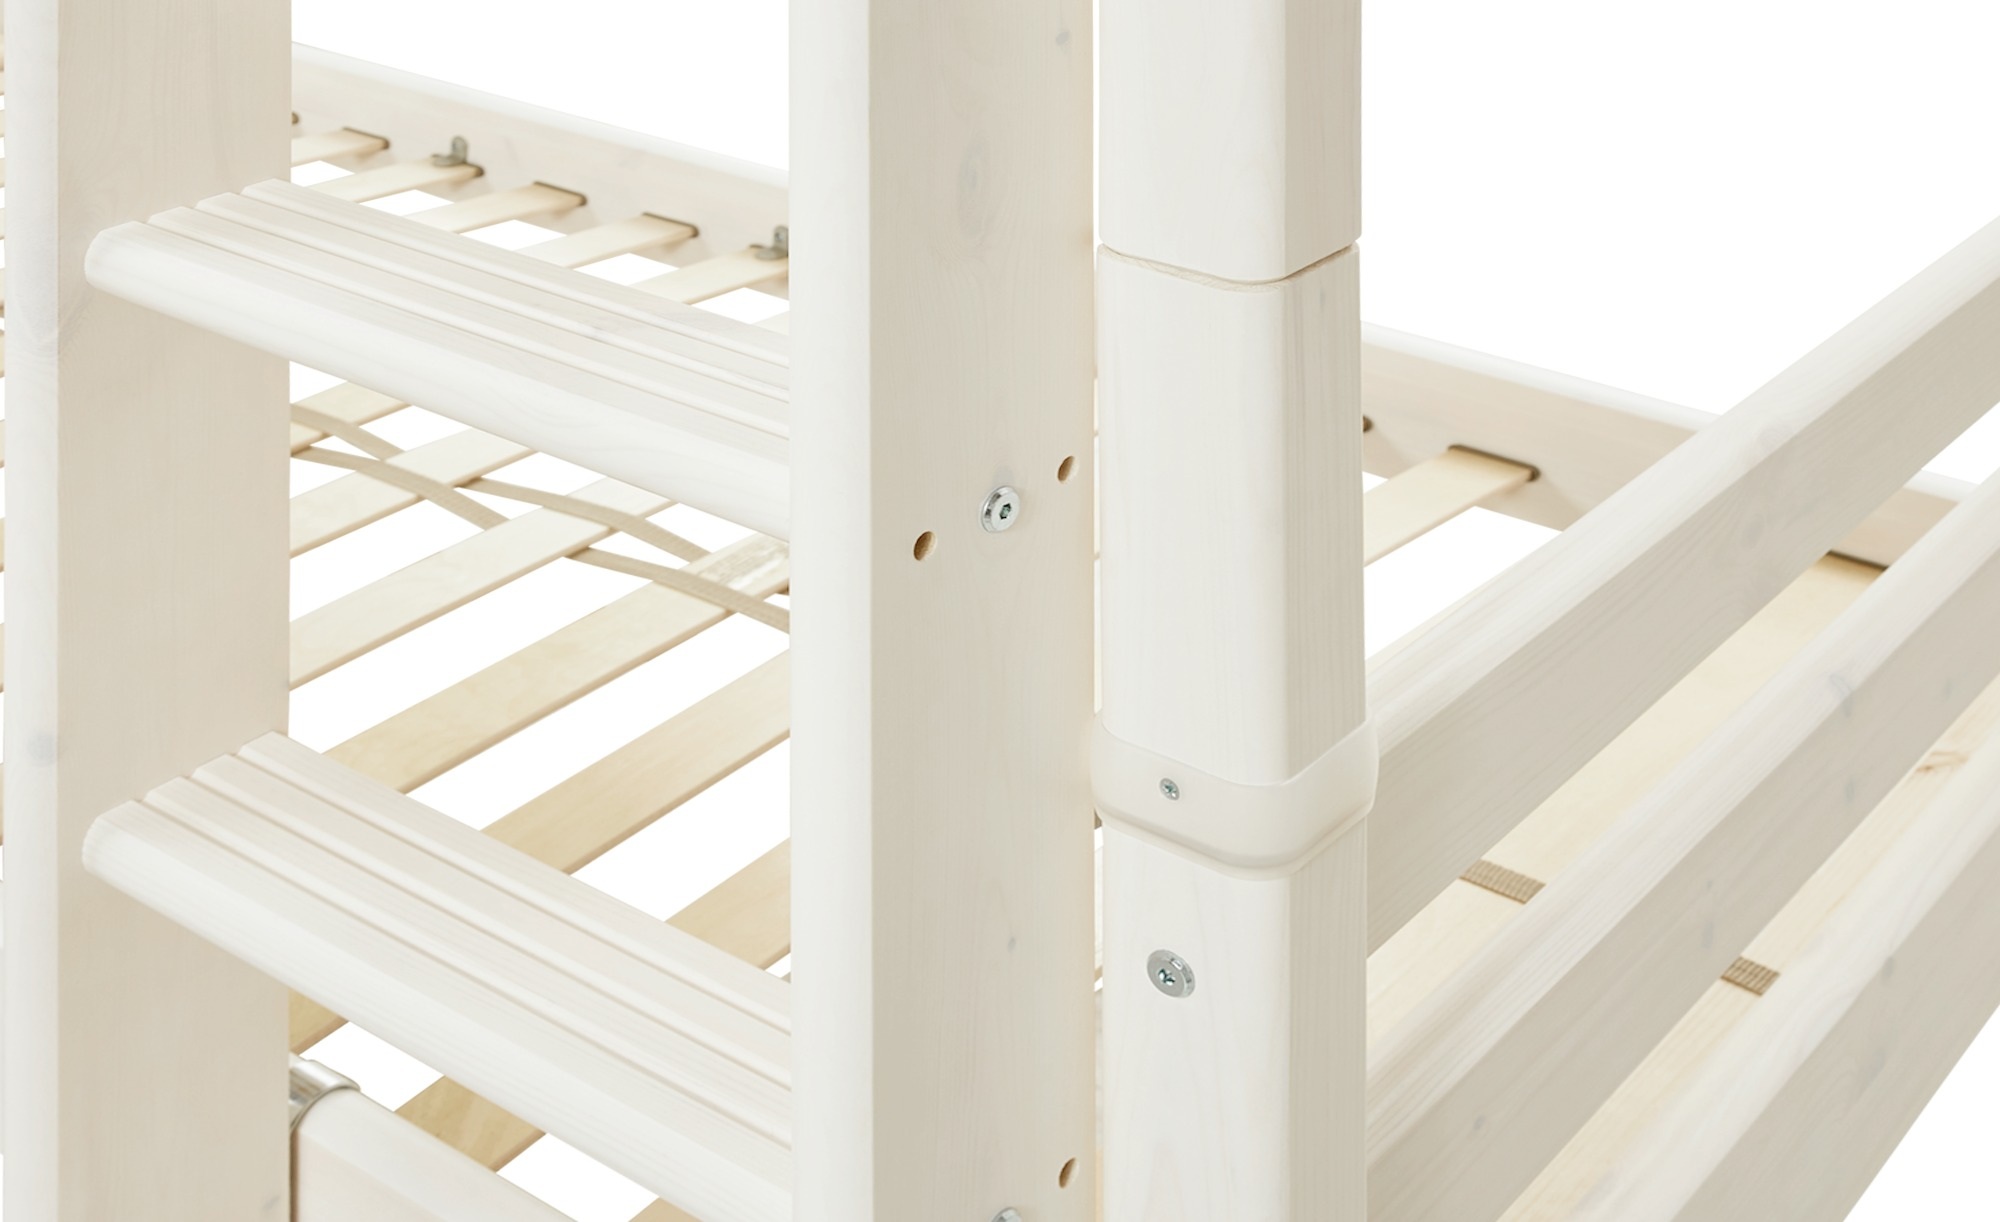 Etagenbett Kiefer Weiß : Etagenbett kiefer massiv cm teilbar pick up möbel